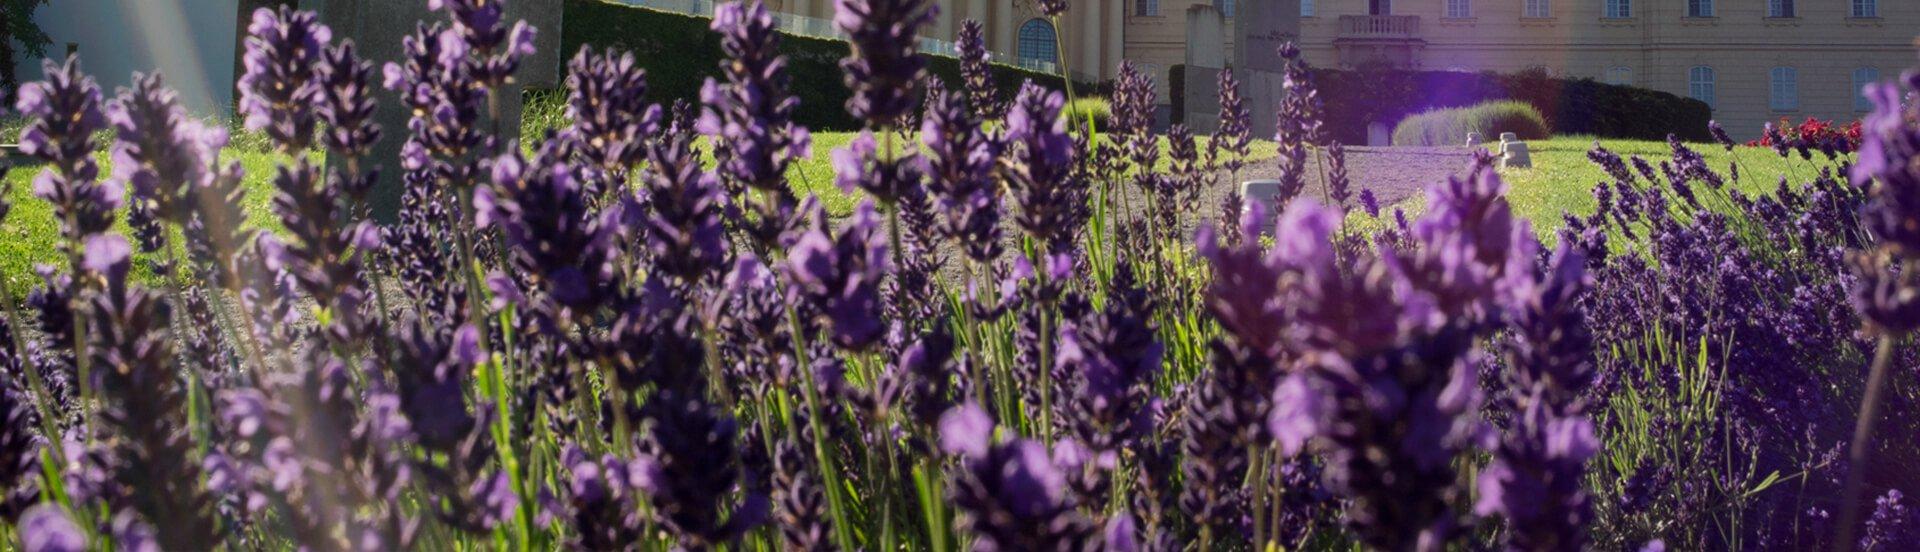 Lavendel vor dem Stift Klosterneuburg